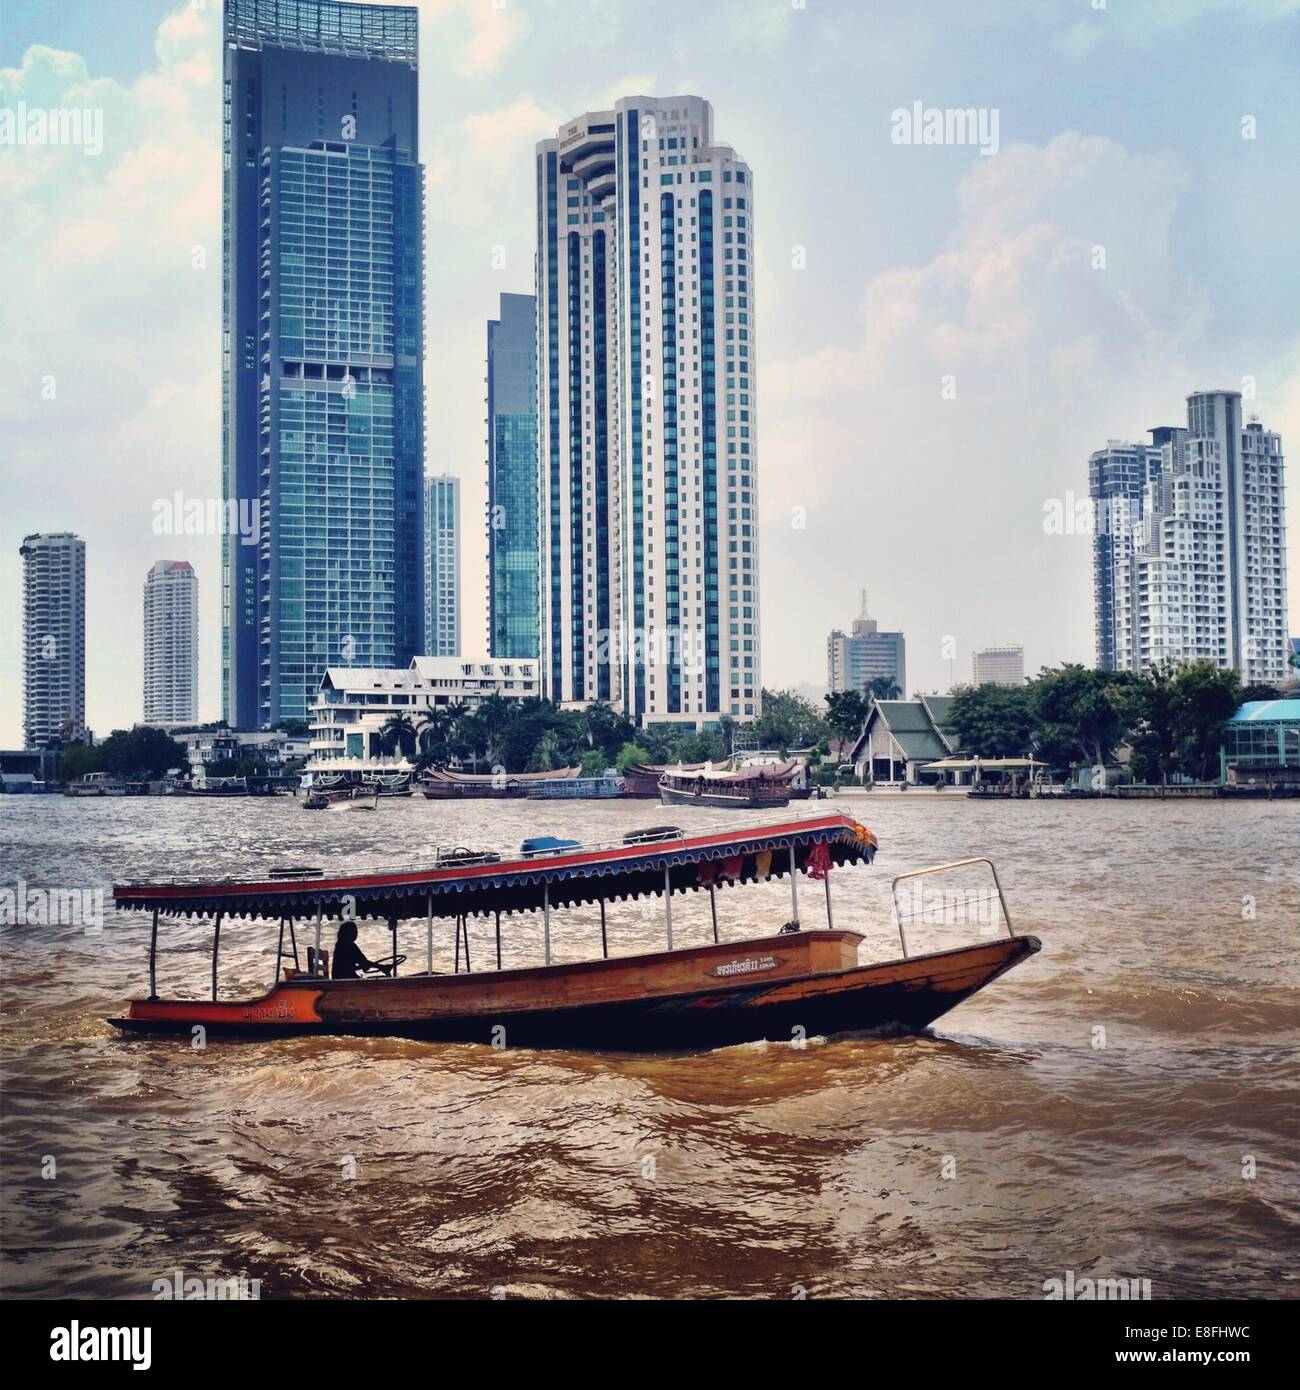 Thailand, Bangkok, Flussschiff und Stadtbild Stockbild